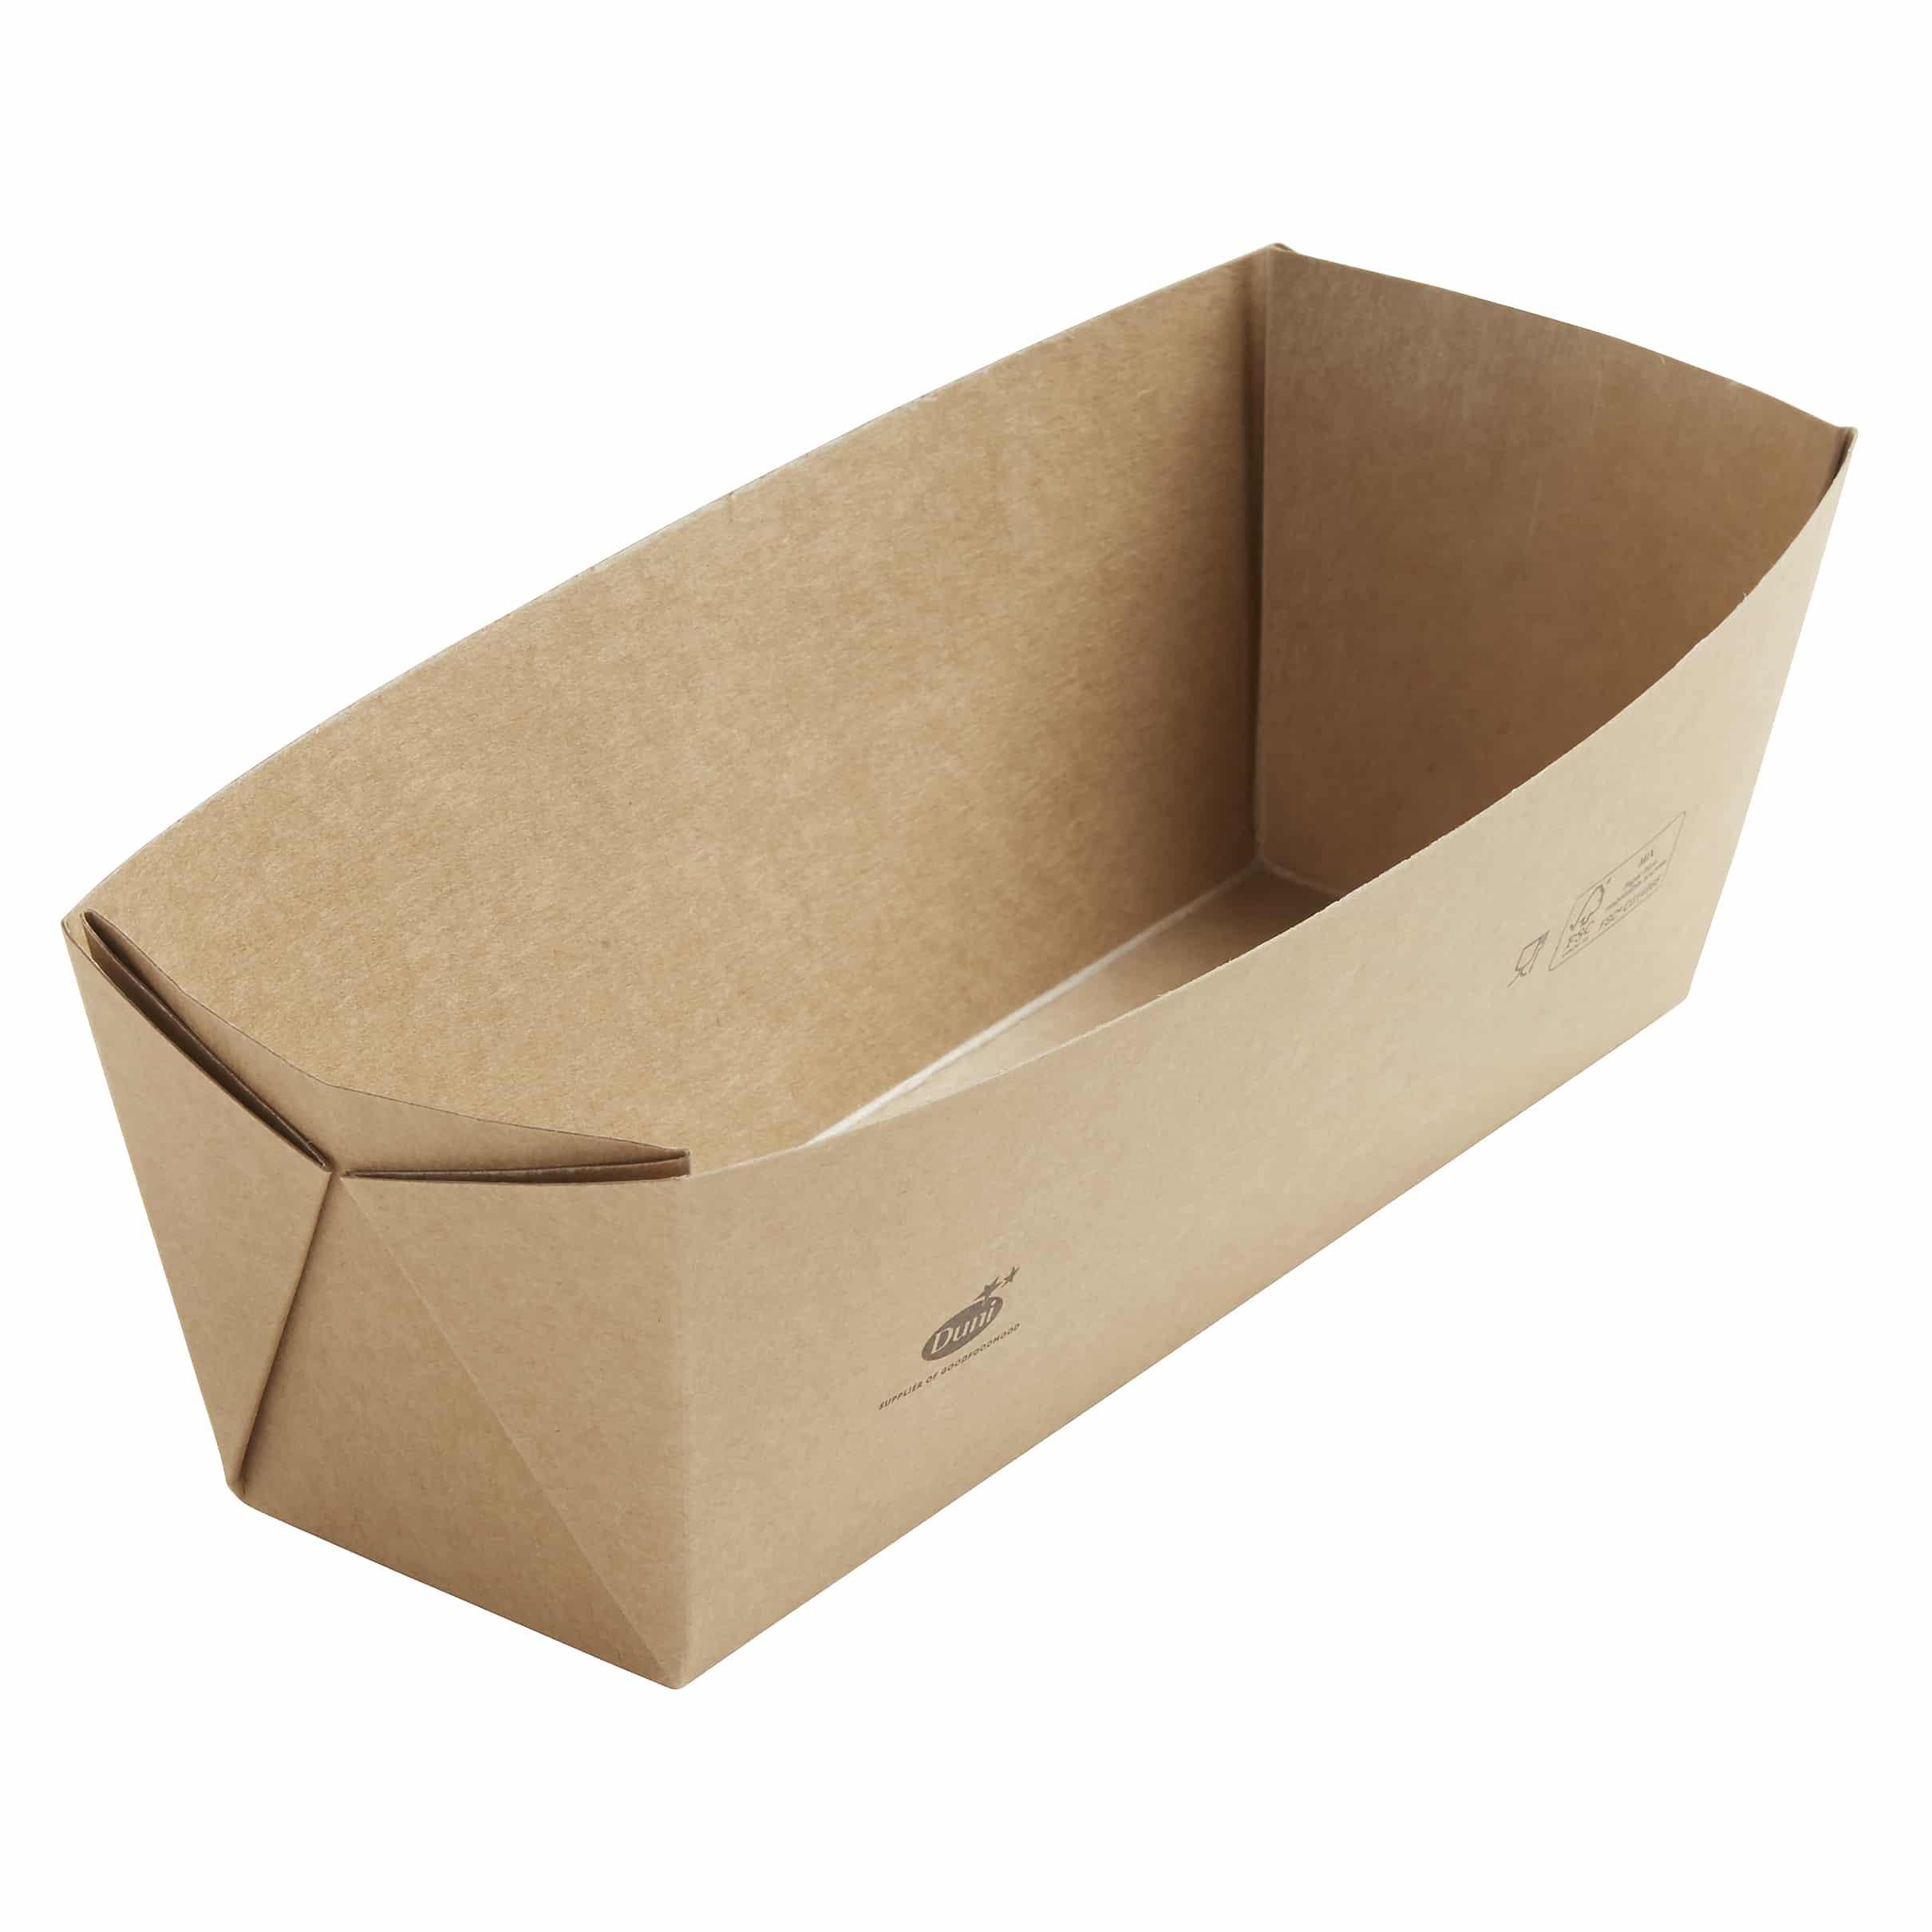 Duni Viking Ecoecho Box Slim Brick 1000ml (Set van 300)